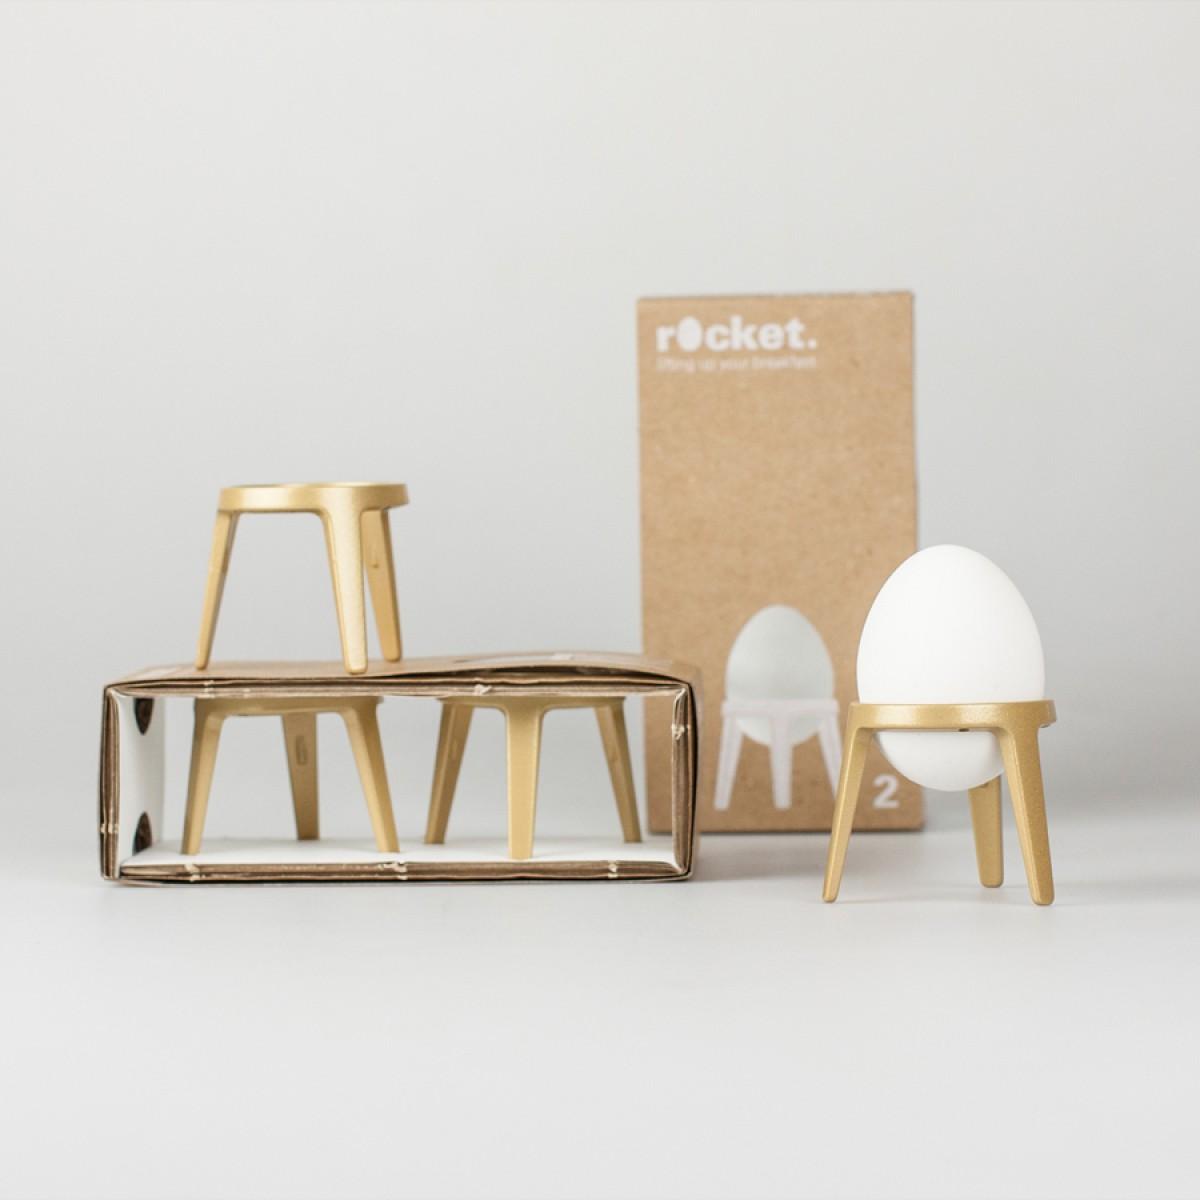 rocket - Design Eierbecher aus Metall - 2er Geschenkset (gold / schwarz / weiß)